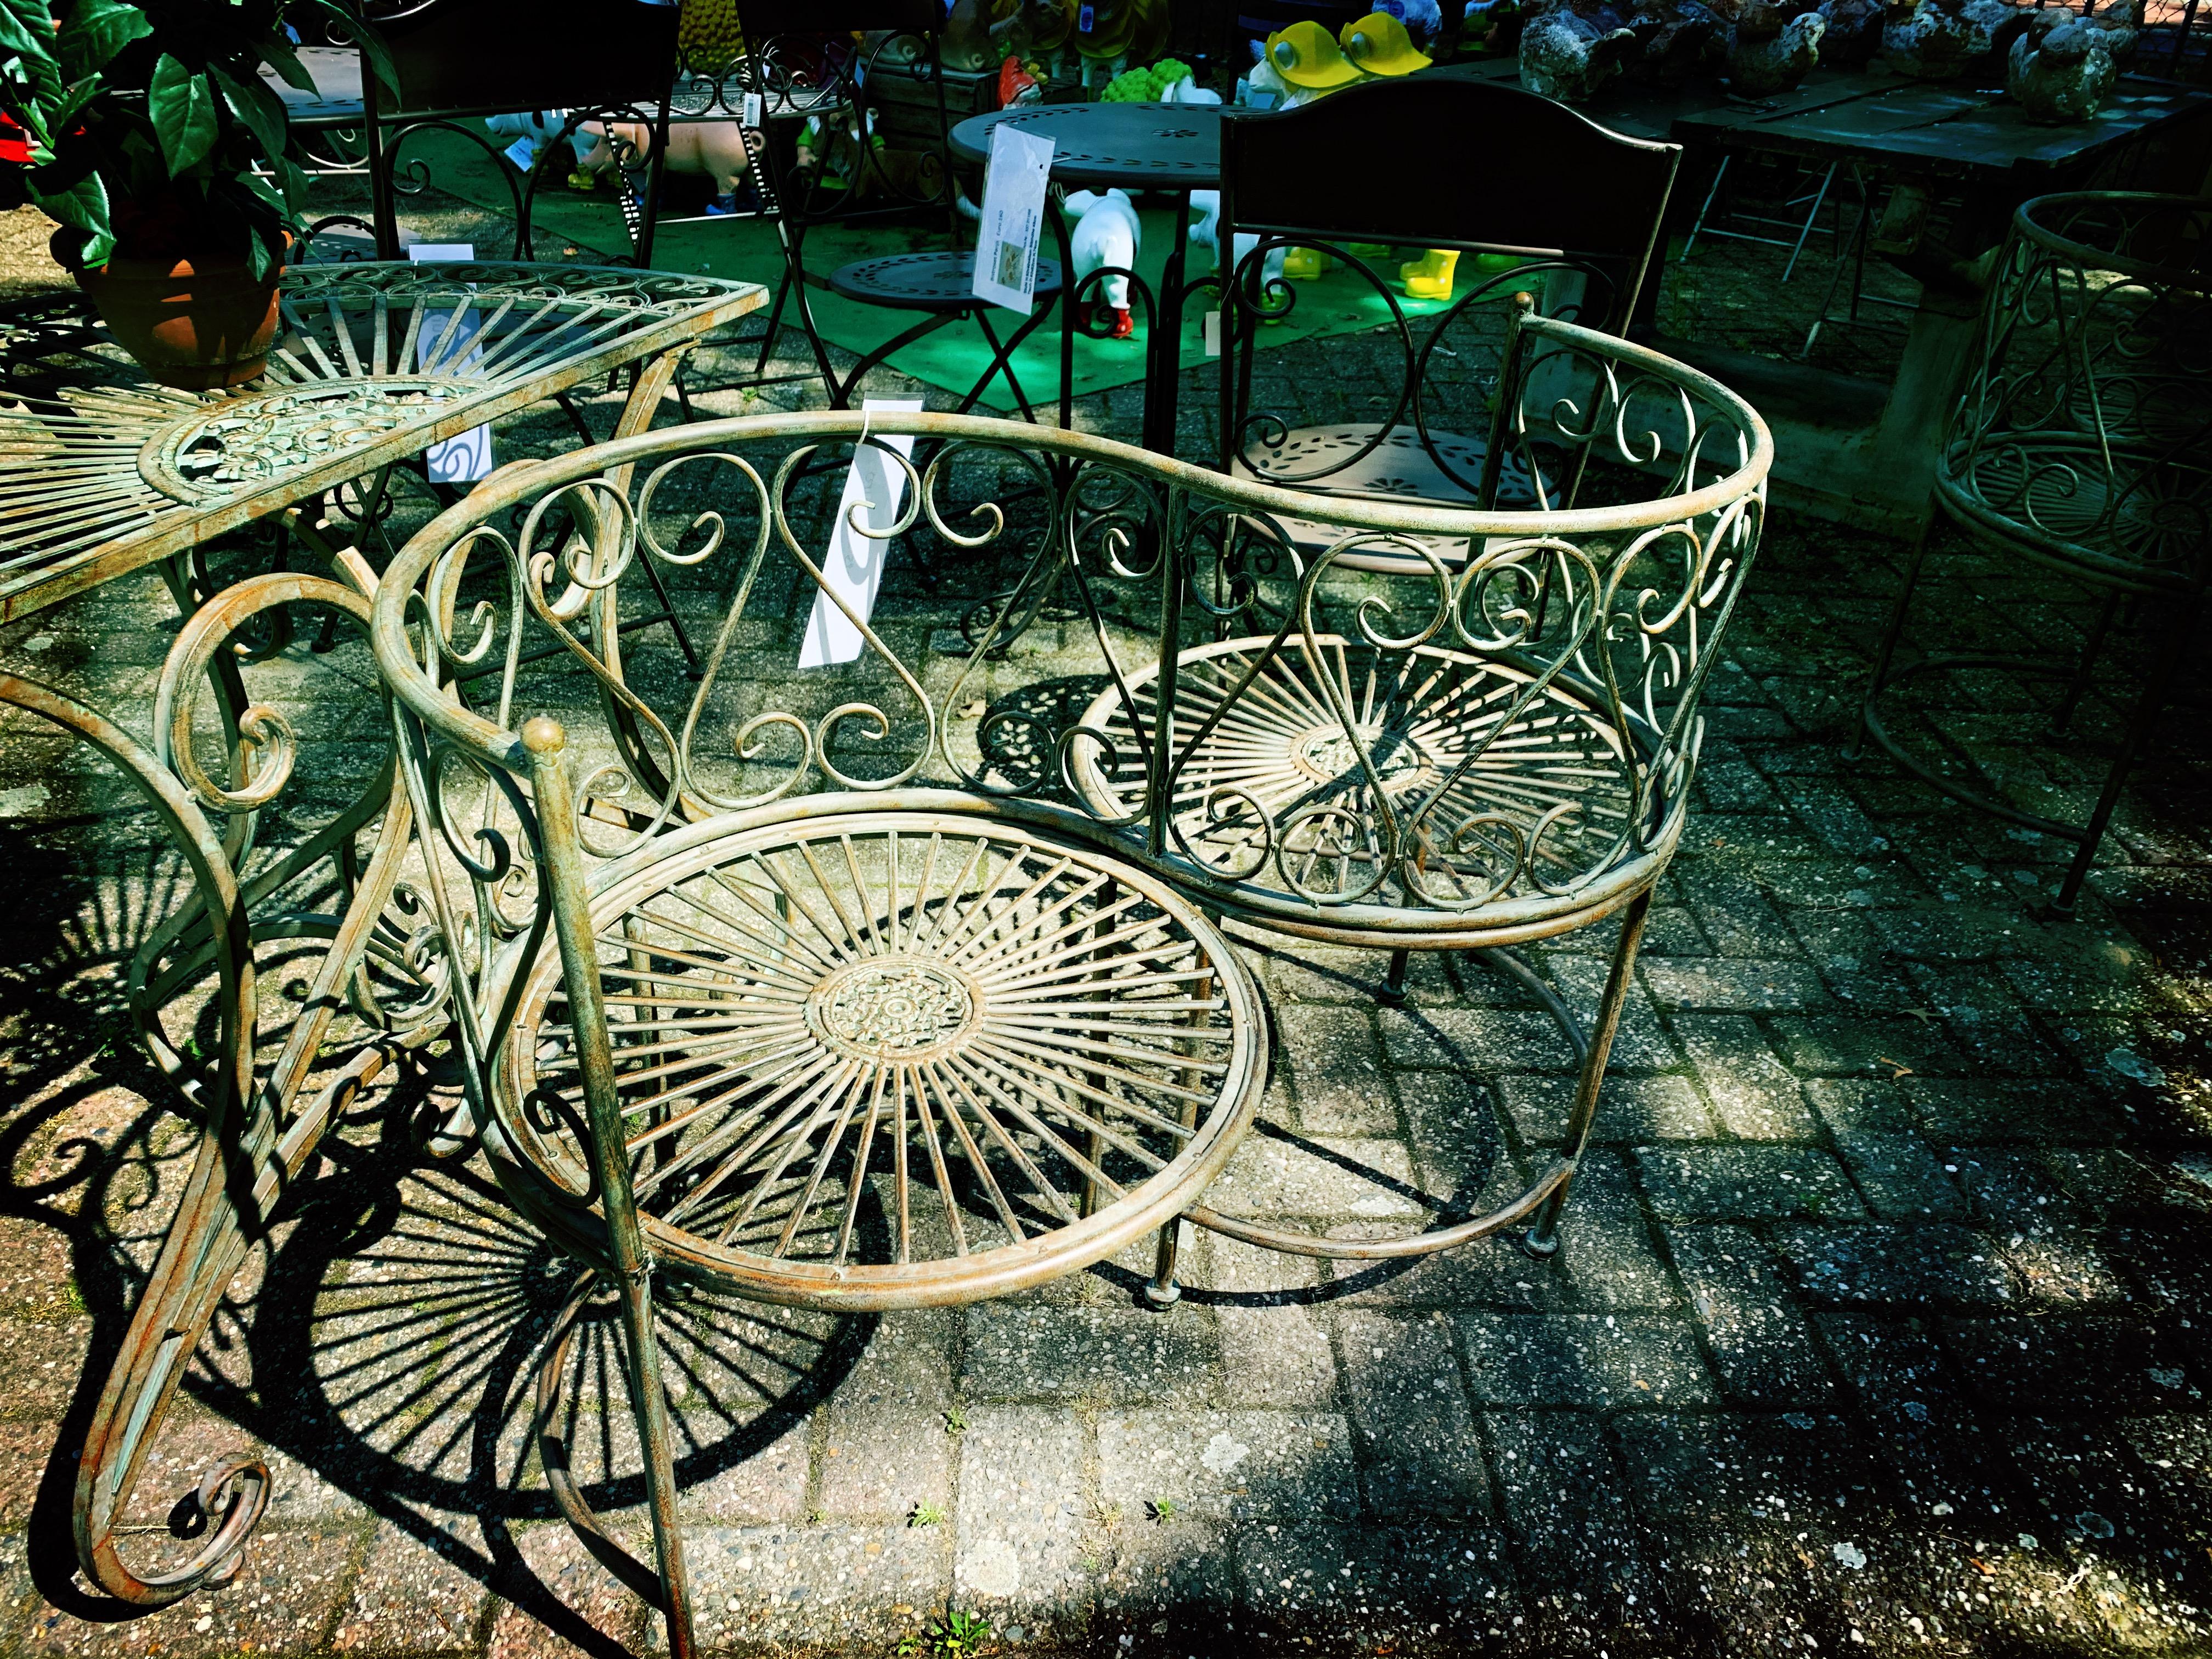 romantisch antiek zitje tuinmeubel